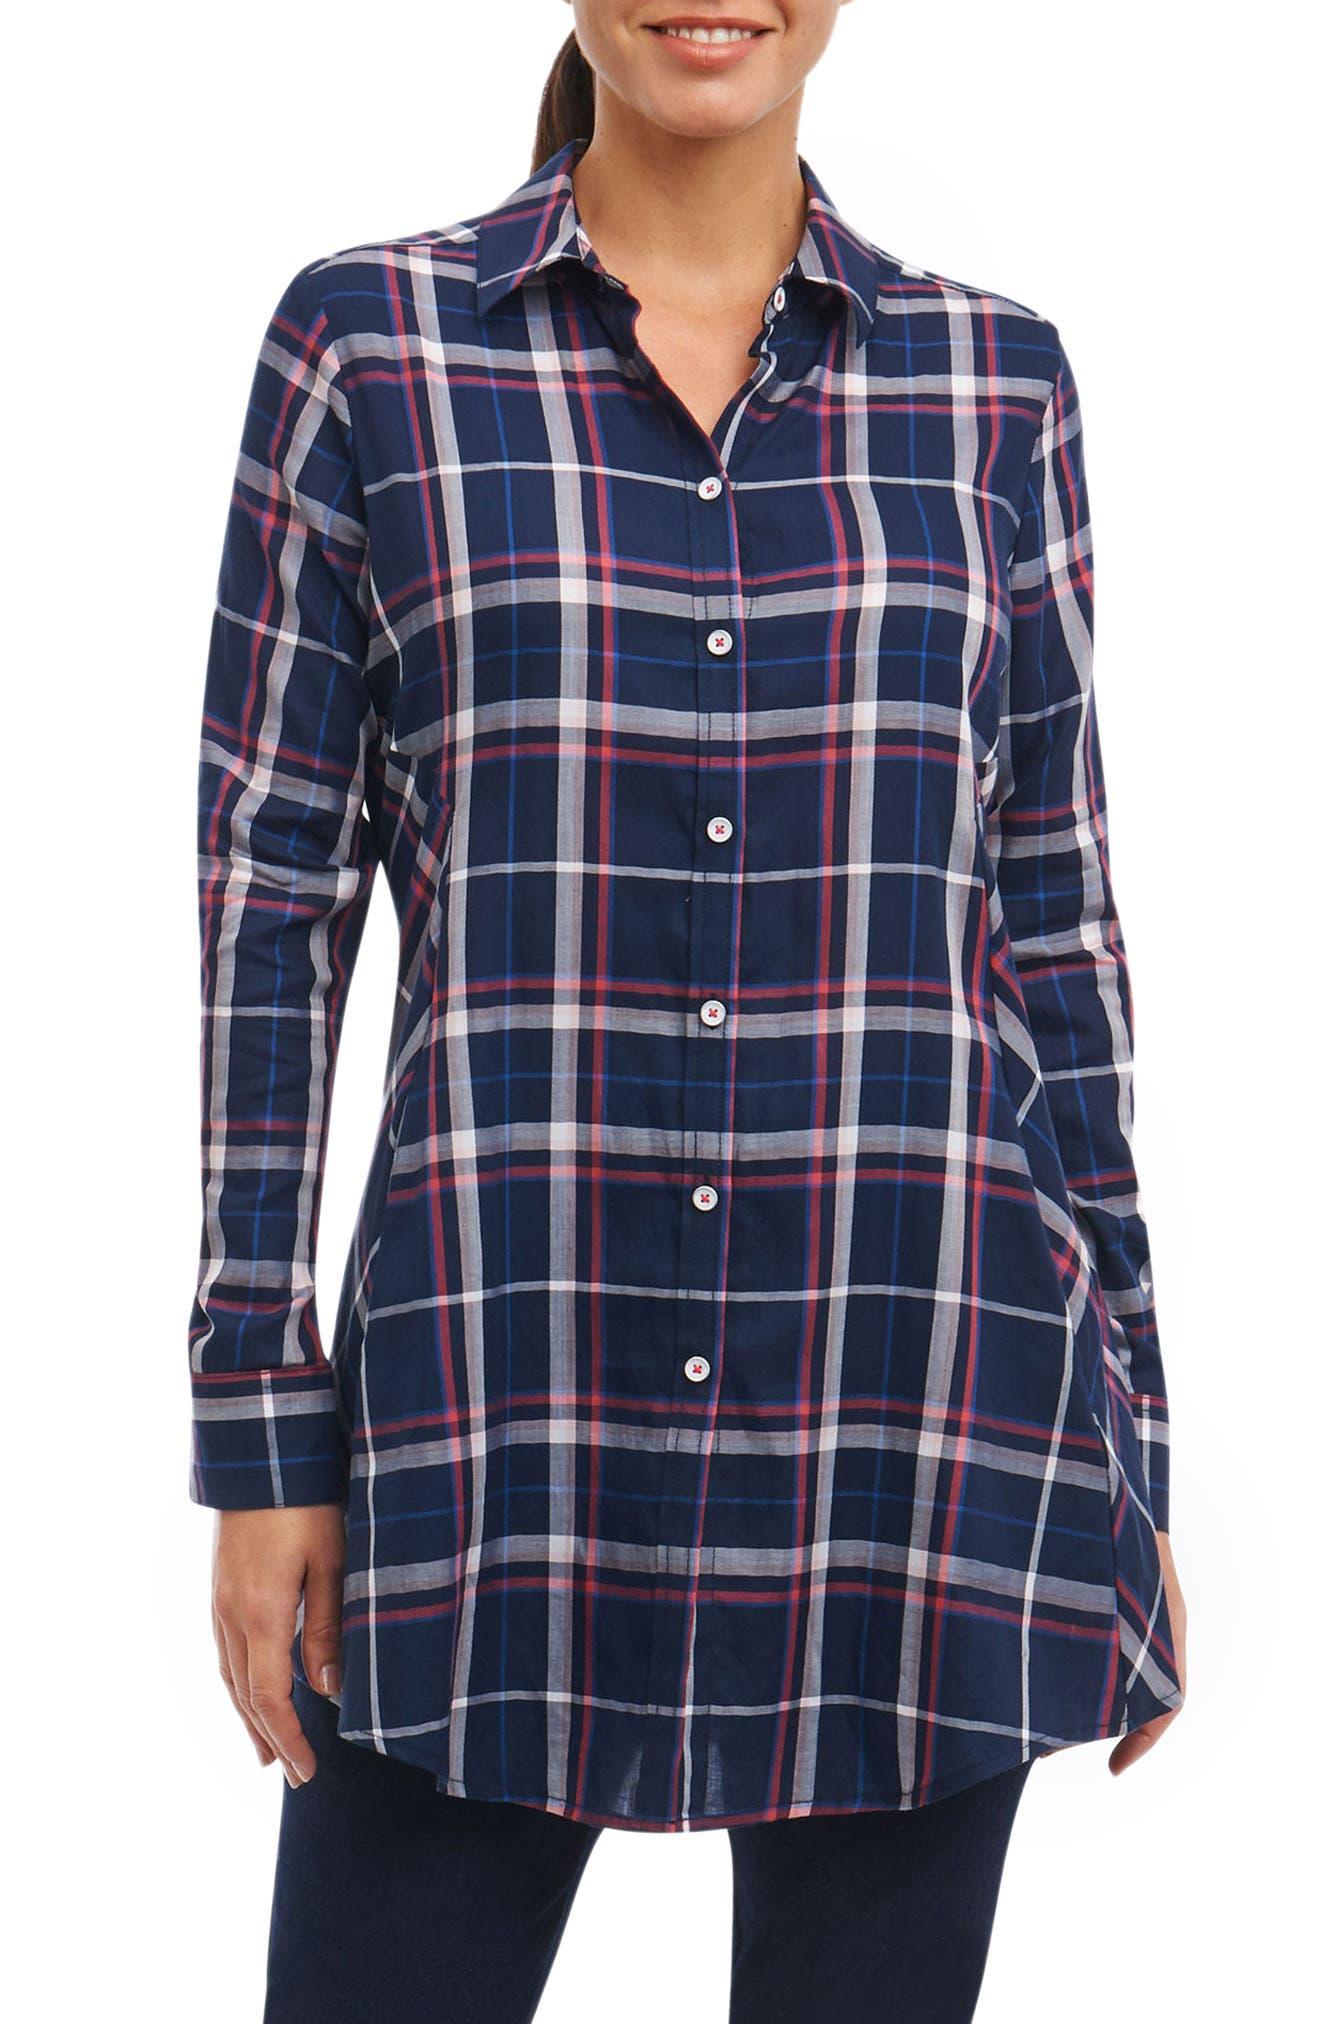 Cici Plaid Shirt,                         Main,                         color, 462